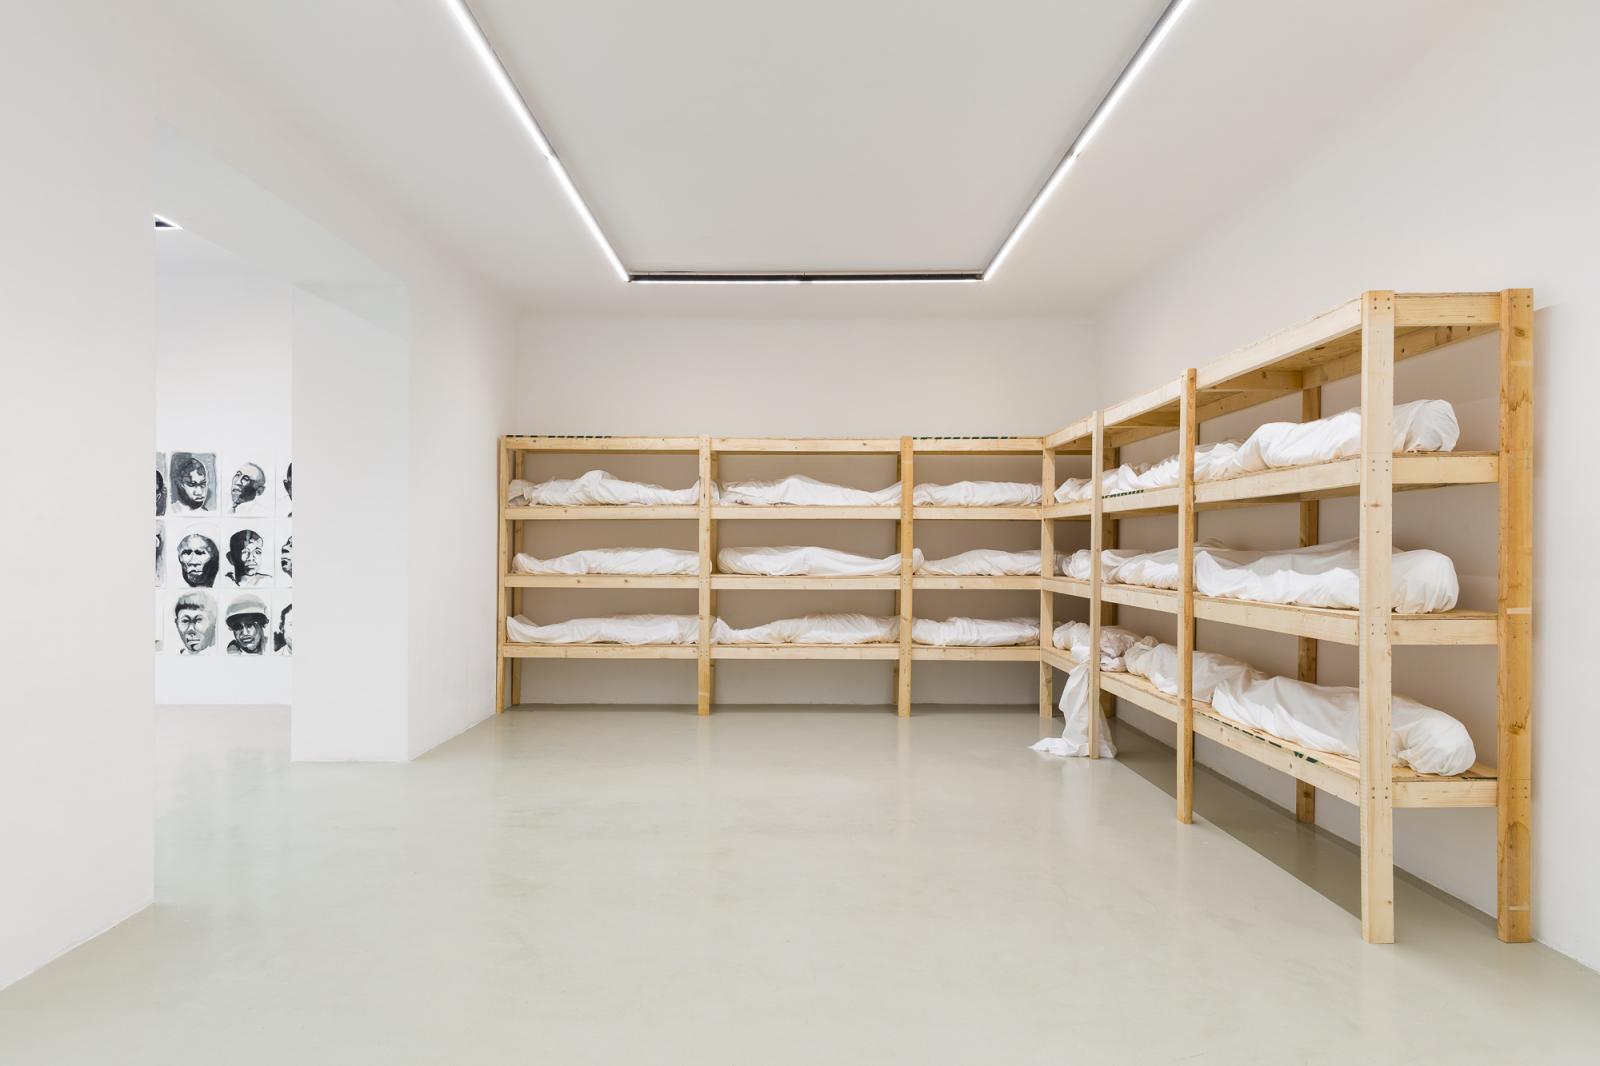 "Galerie Lisa Kandlhofer, curated by Bonaventure Soh Bejeng Ndikung, 2020; Exhibition view, ""Olu Oguibe"", /The Saddness Descends Again/  Photo:Olu Oguibe"